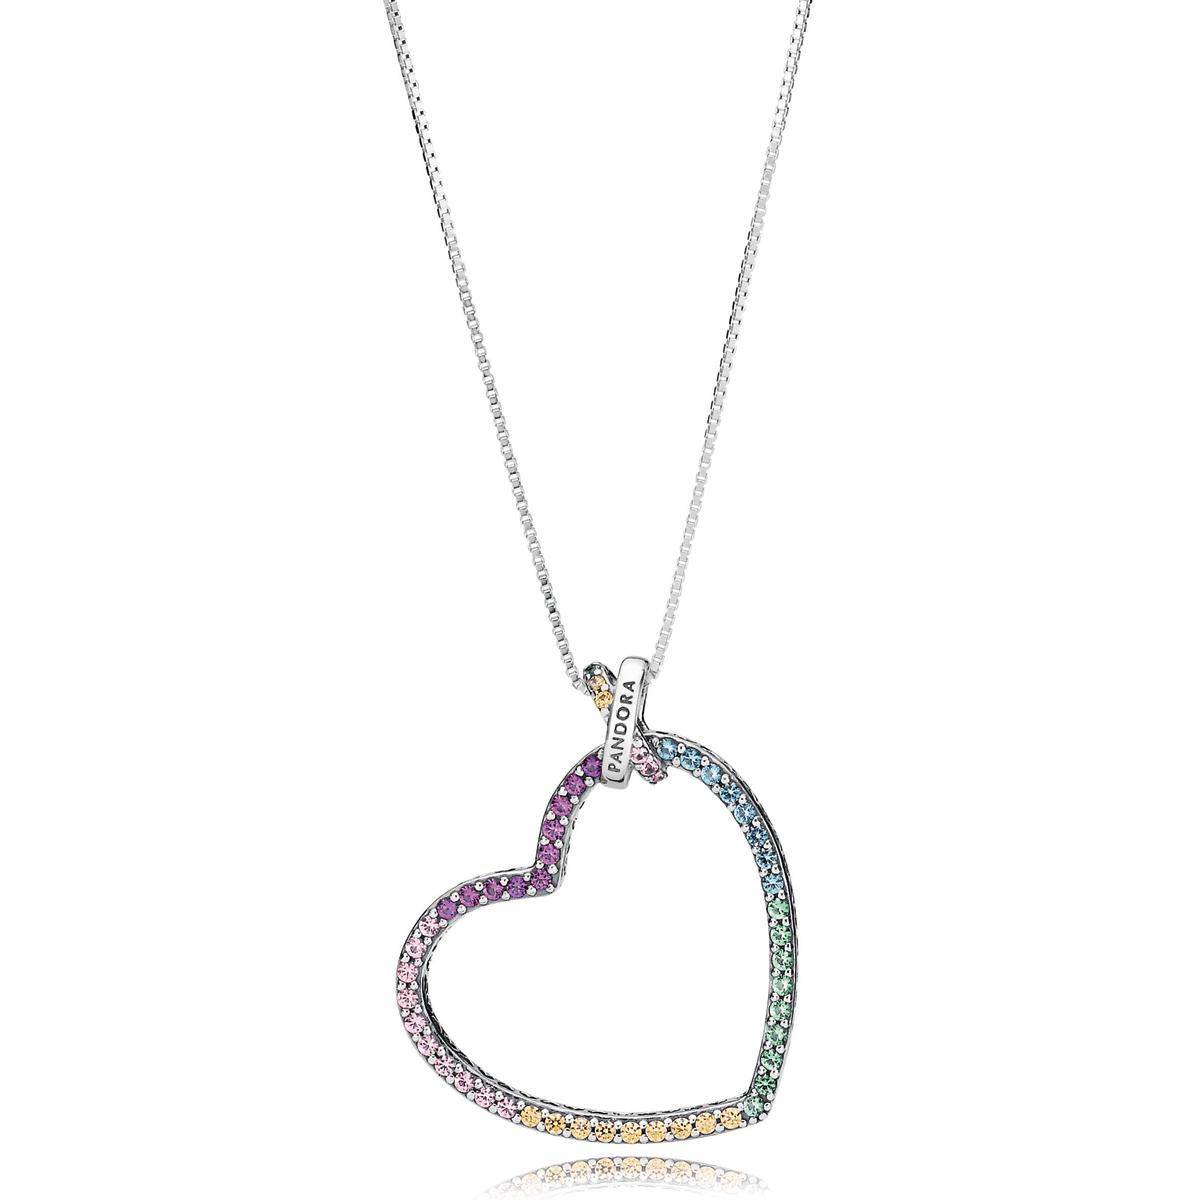 Pandora multi colored heart necklace pancharmbracelets pandora multi colored heart necklace pandora multi colored heart necklace aloadofball Gallery